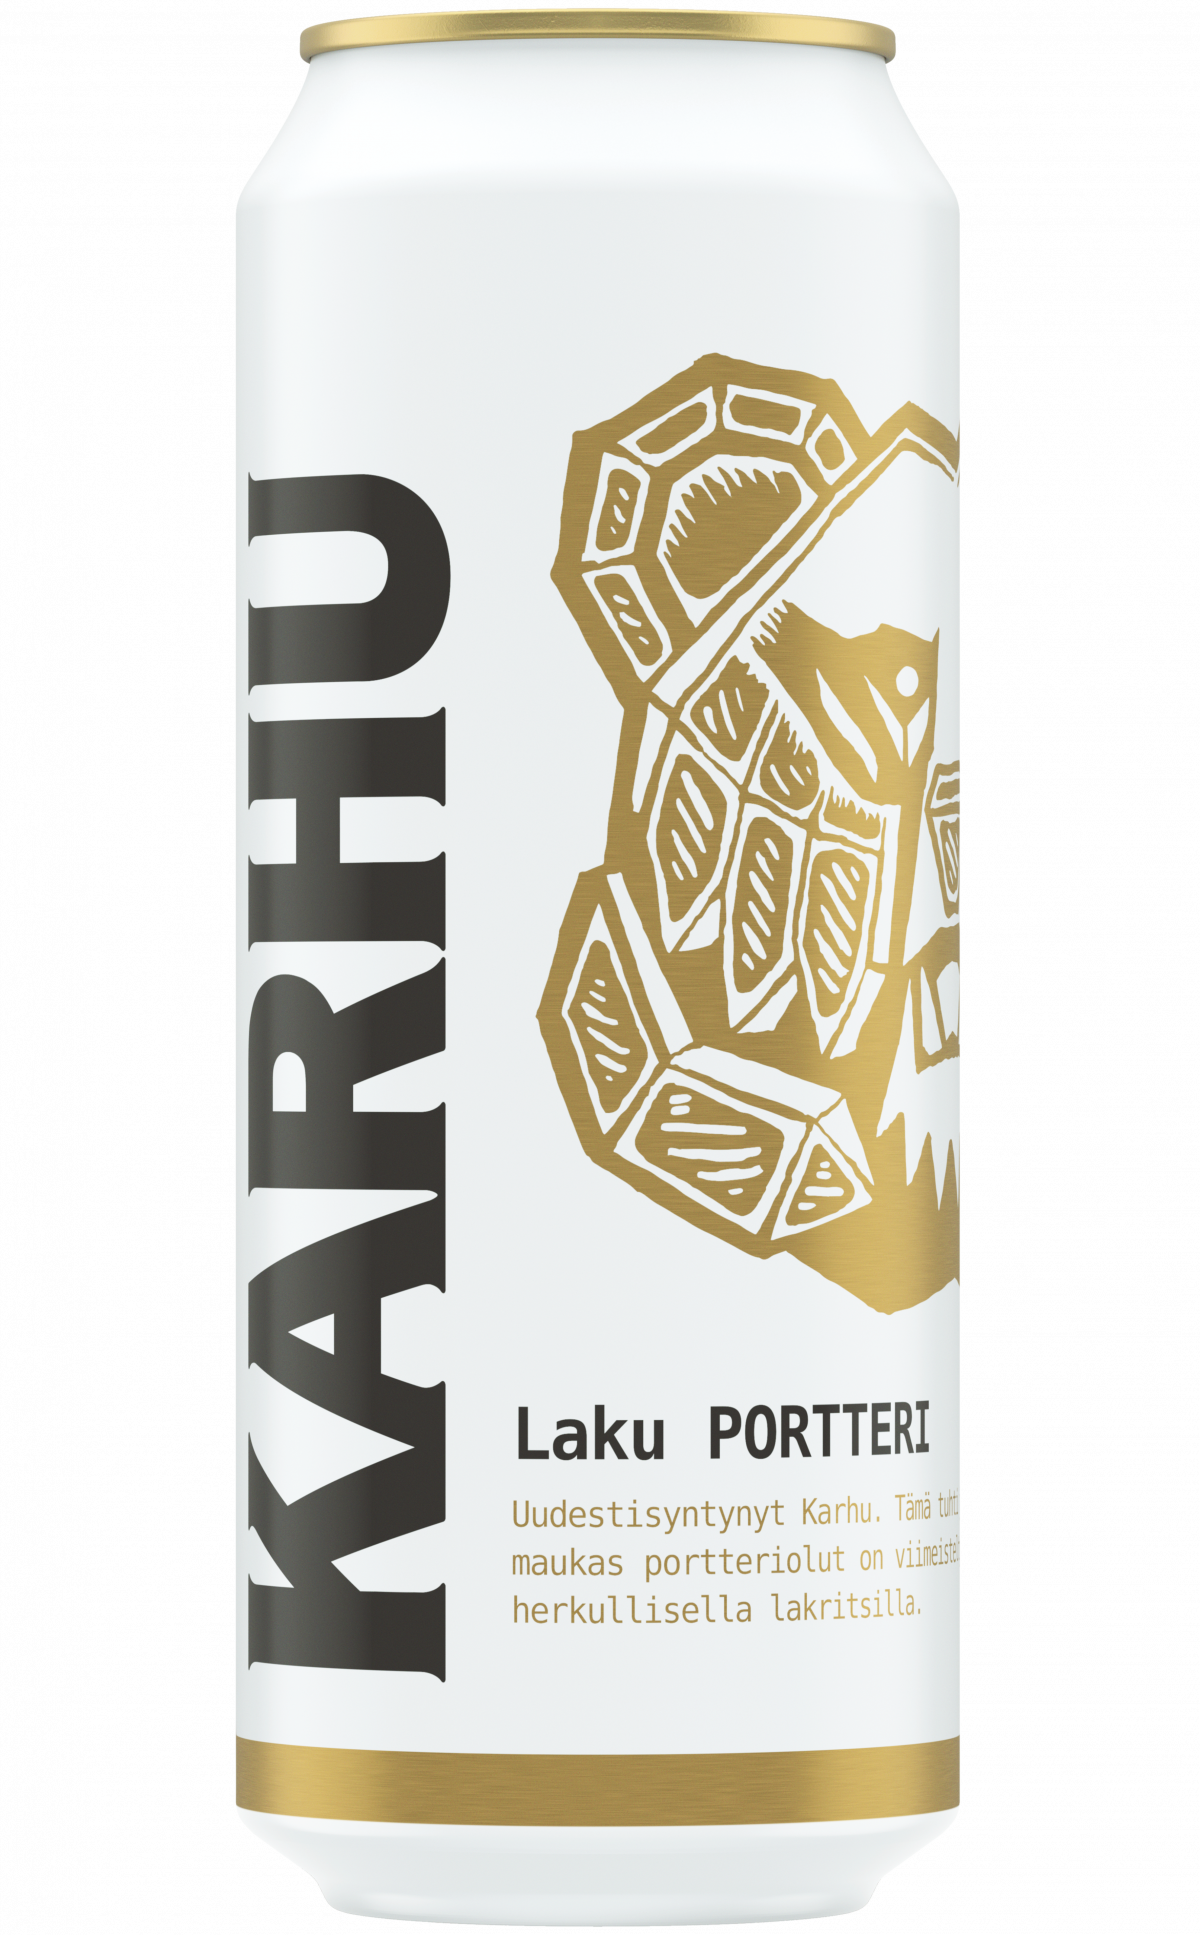 KARHU LAKU PORTTERI